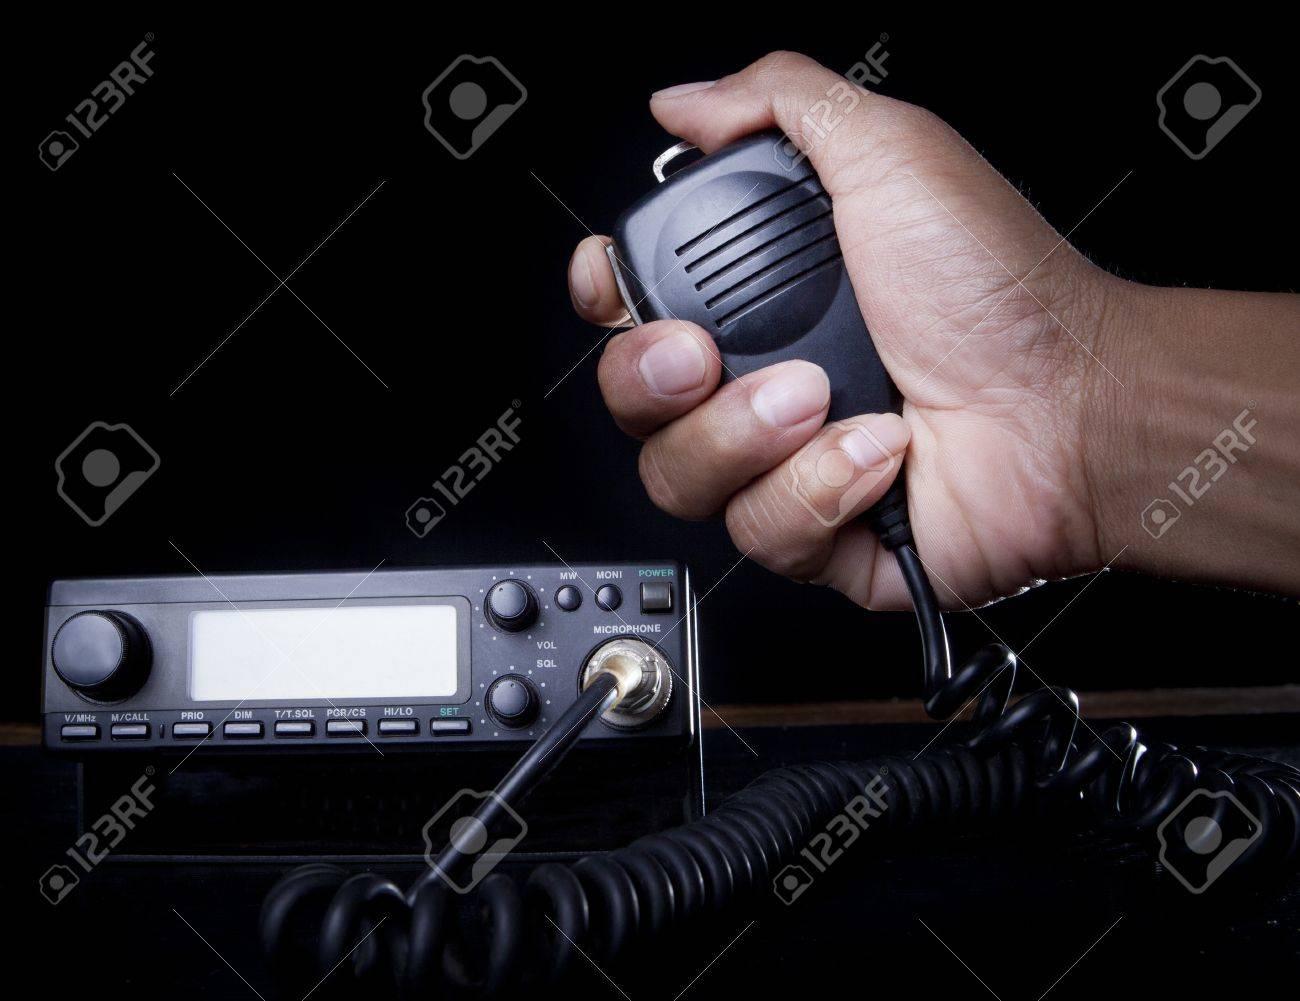 hand of Amateur radio holding speaker and press for radio communication theme - 20411426